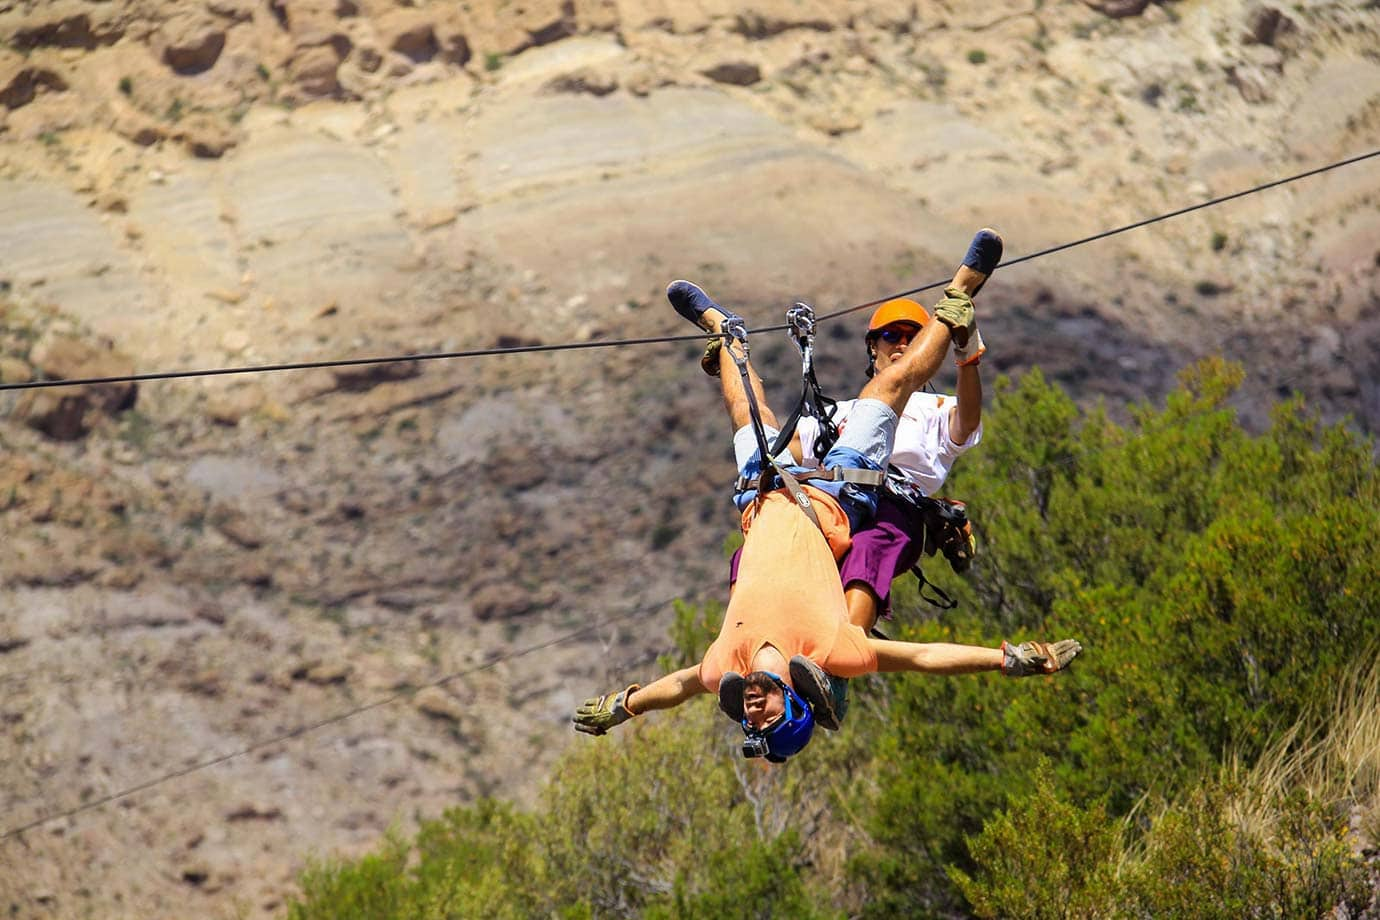 Upside down ziplining